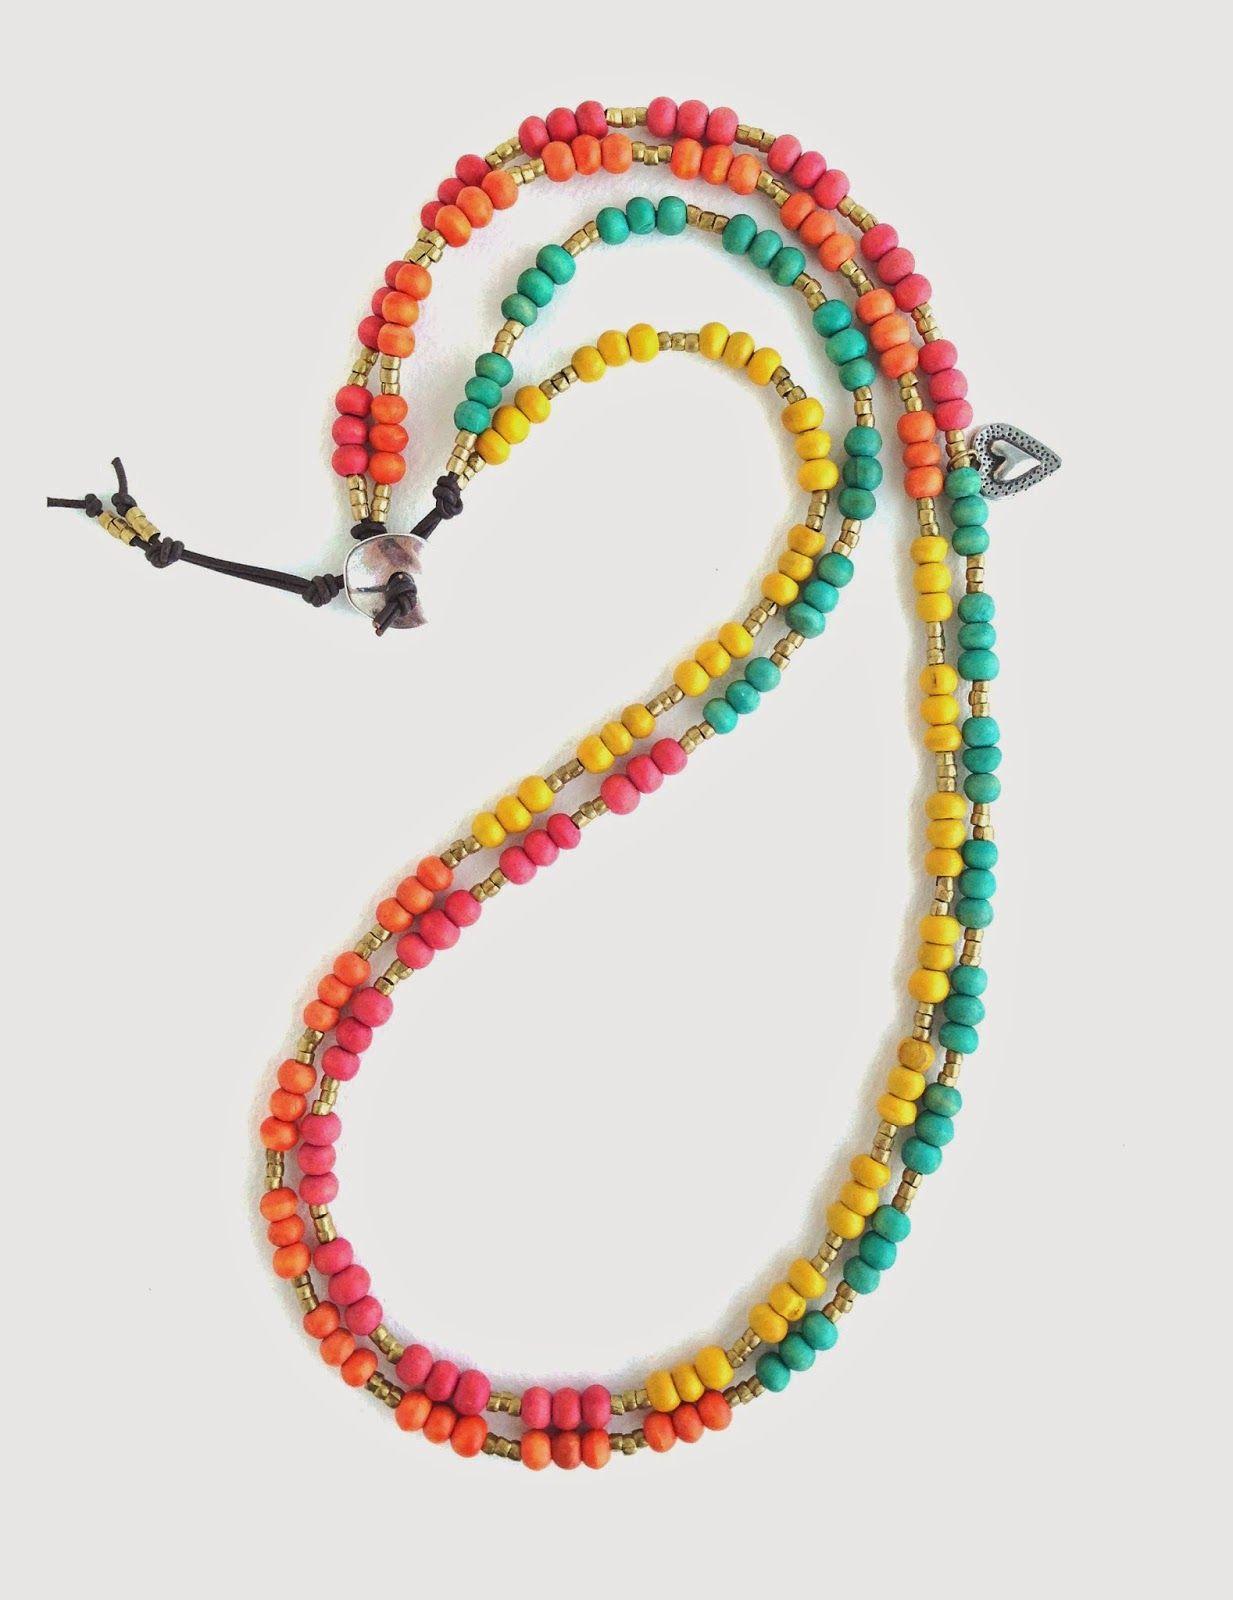 Erin Siegel Jewelry: Color Me Happy Necklace/Bracelet Wrap DIY TUTORIAL